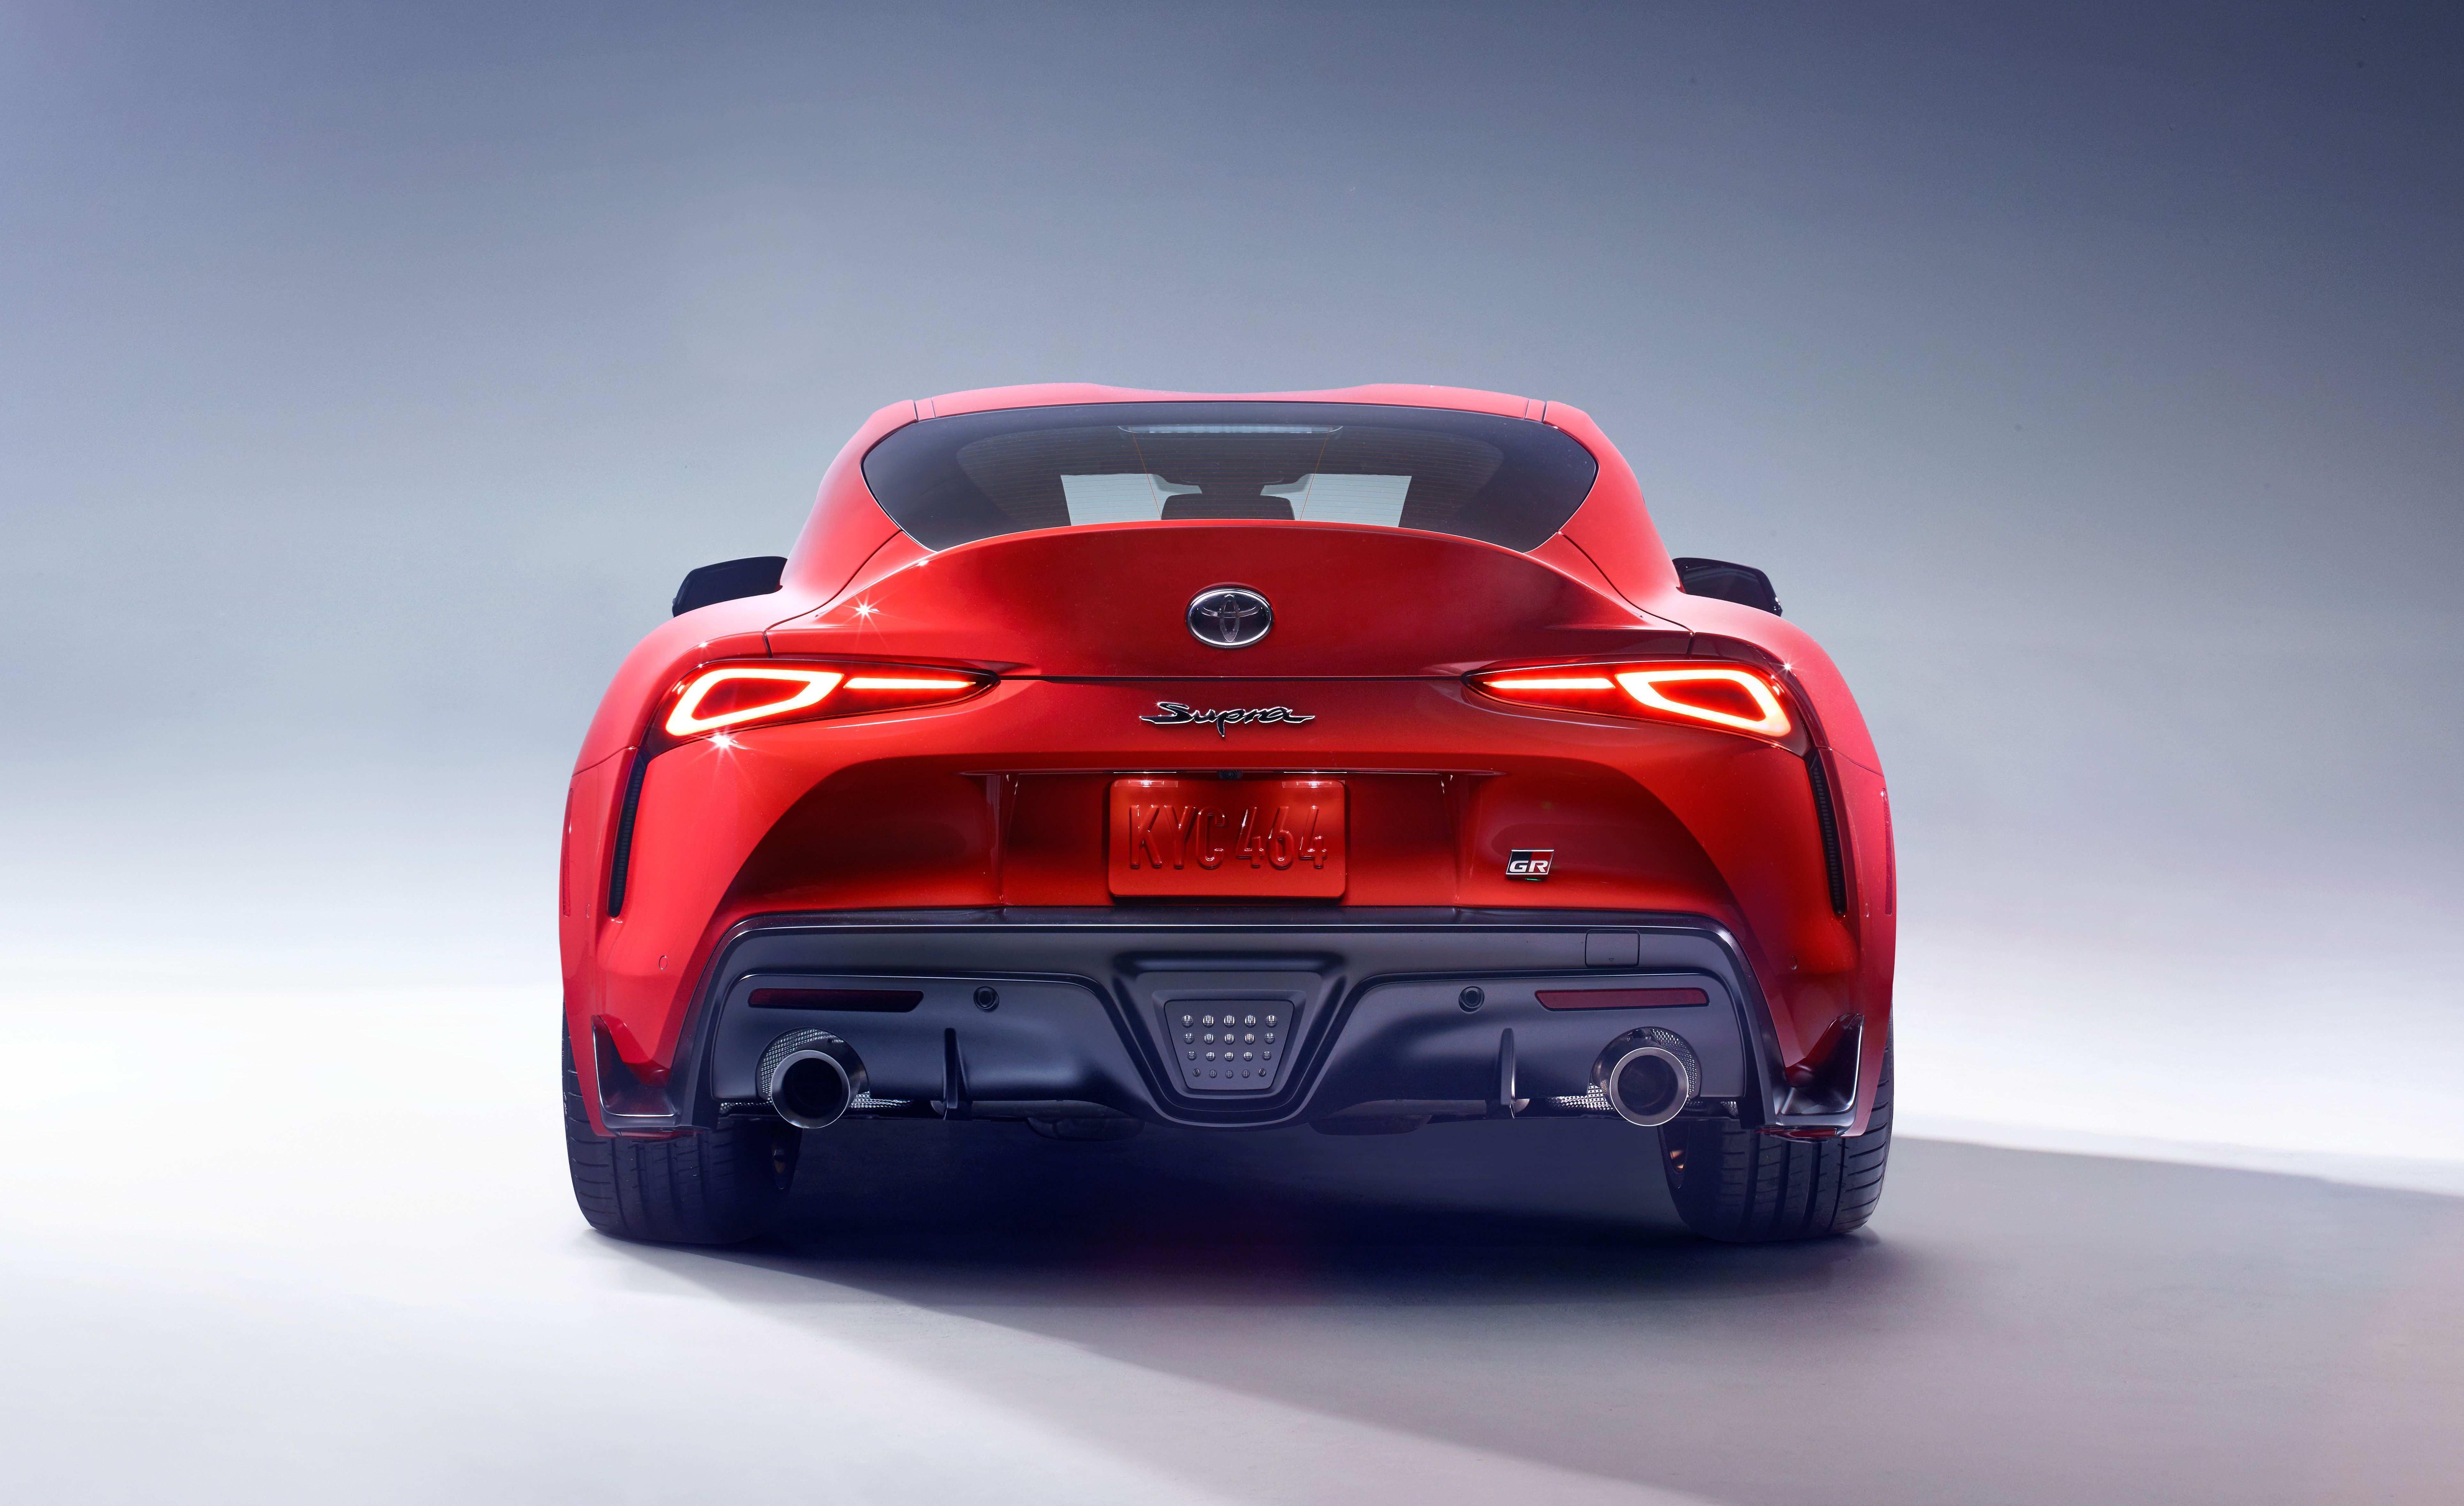 24 Concept of 2020 Toyota Supra Exterior Performance by 2020 Toyota Supra Exterior